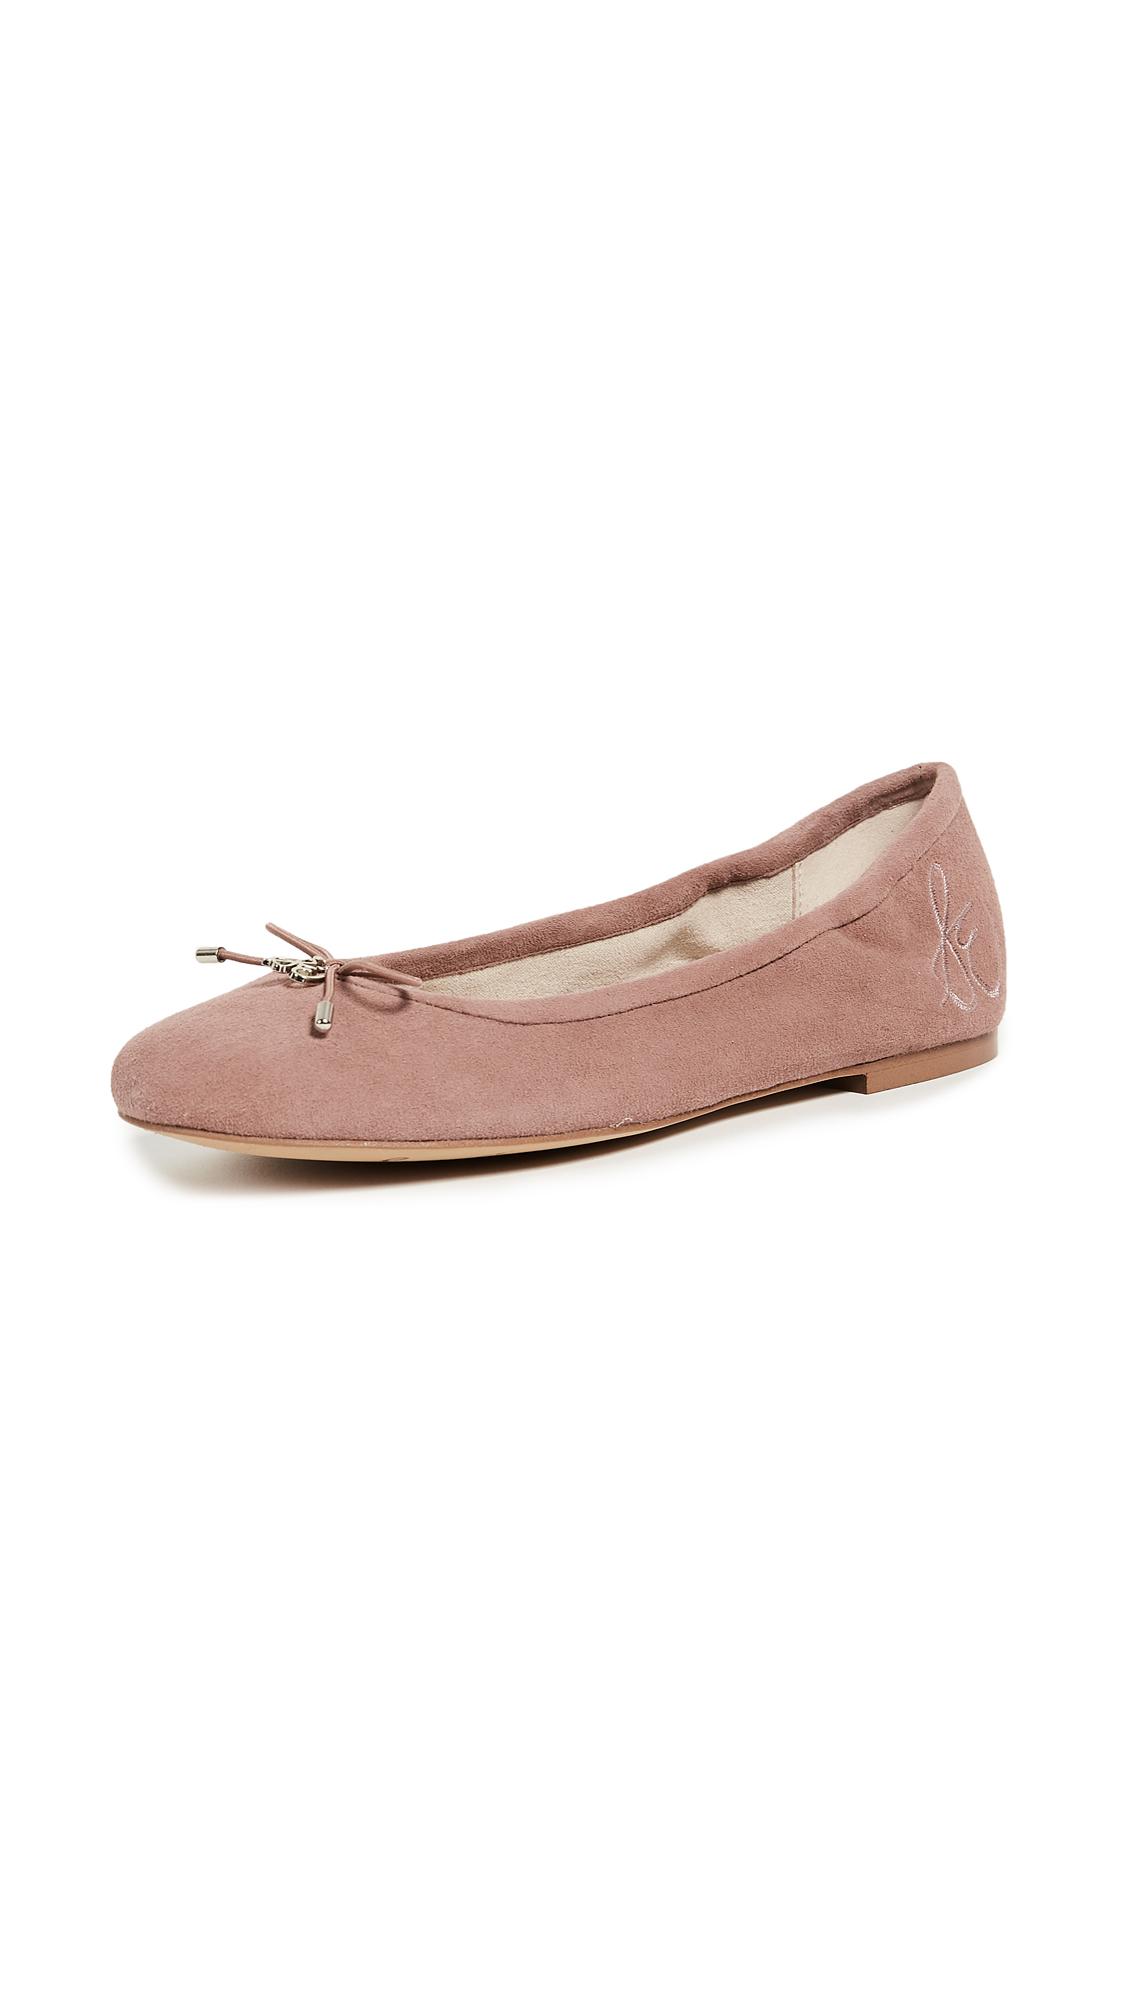 Sam Edelman Felicia Ballet Flats - Dusty Rose